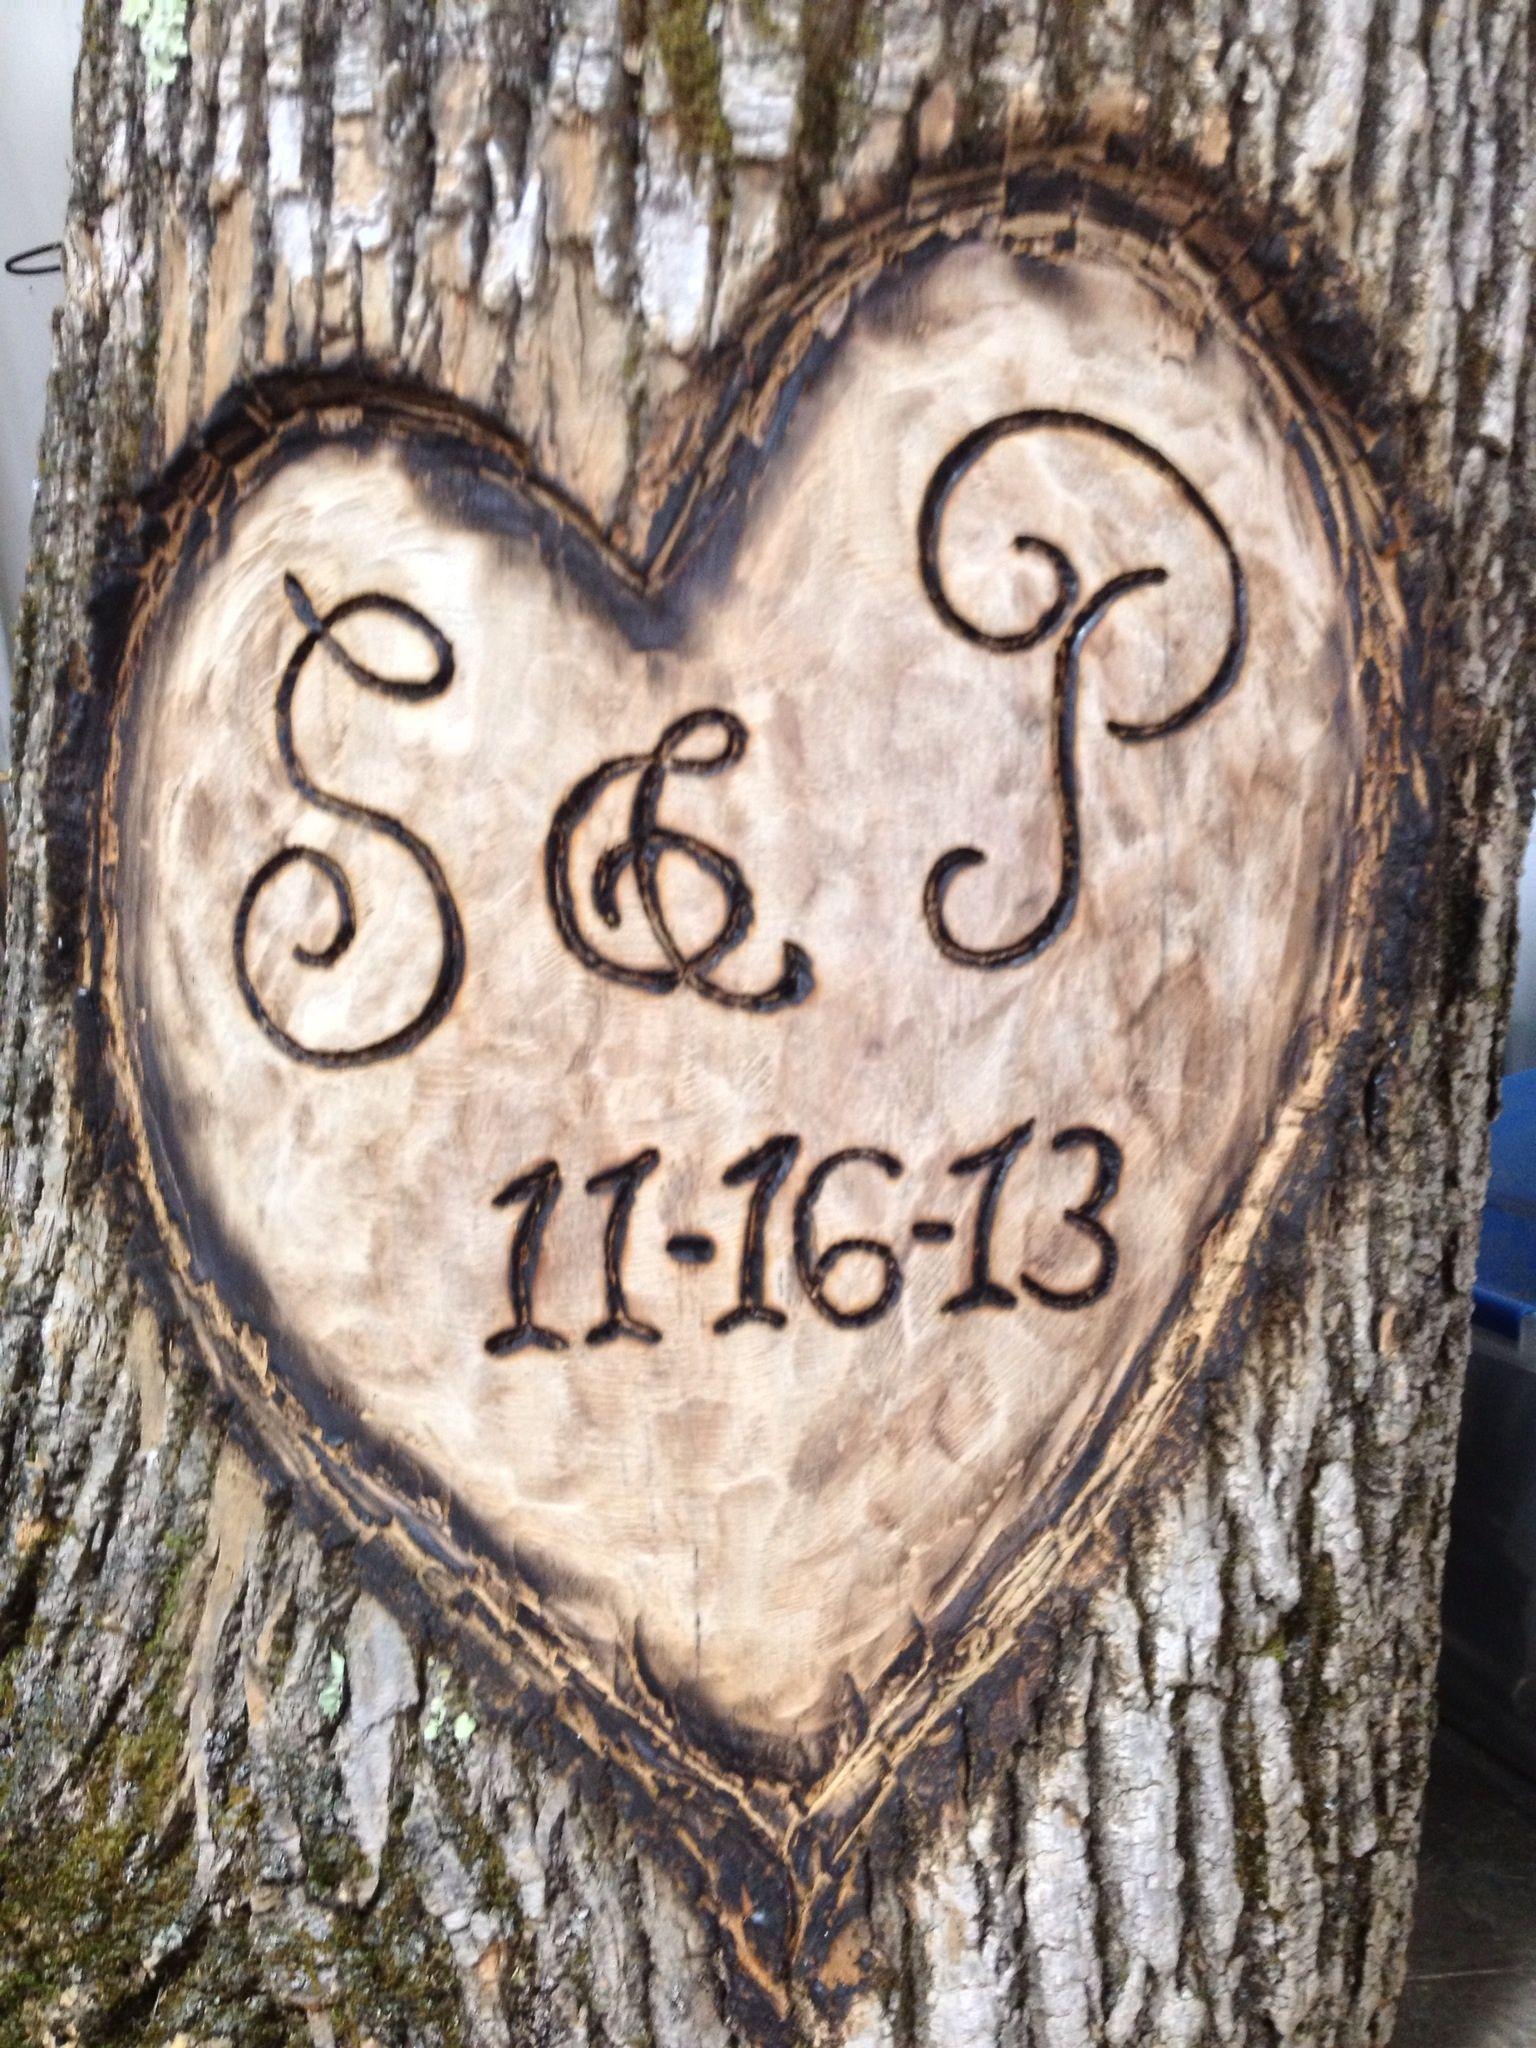 Commemorative Wood Carving Using Chisel And Hammer Hand Held Grinder Dremmel Soldering Iron And Propane Wood Carving Custom Decor Soldering Iron